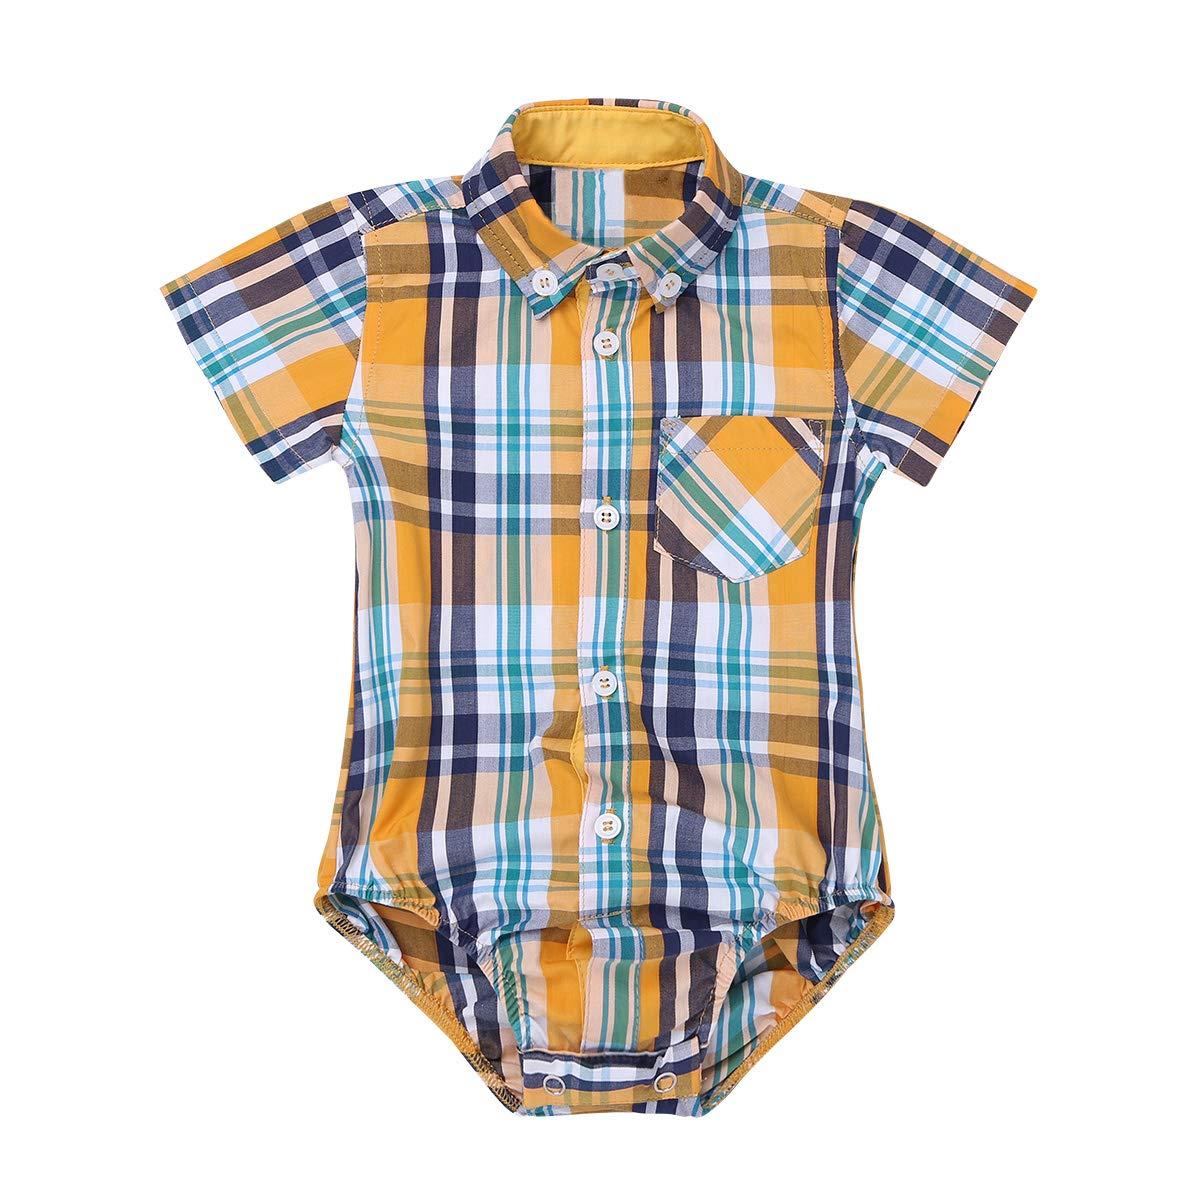 CHICTRY Baby Jungen Smoking Hemd Freizeithemd Neugeborene Kinder Strampler Gentleman Kostüm Festzug Hemd Overall